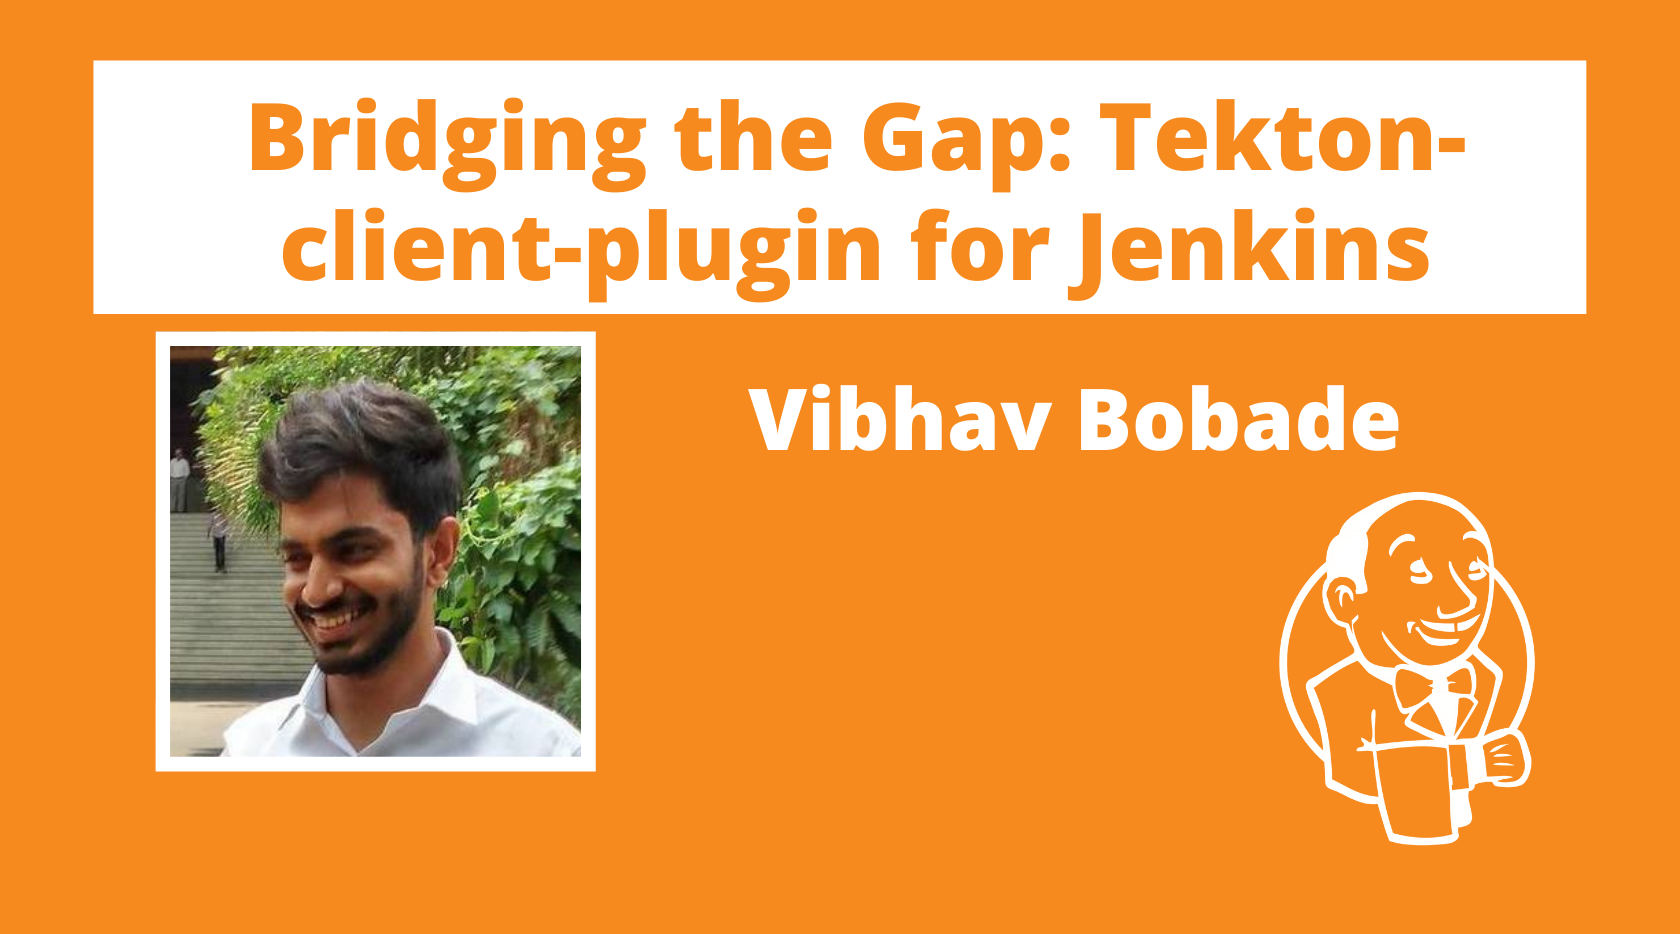 Bridging the Gap: Tekton-client-plugin for Jenkins